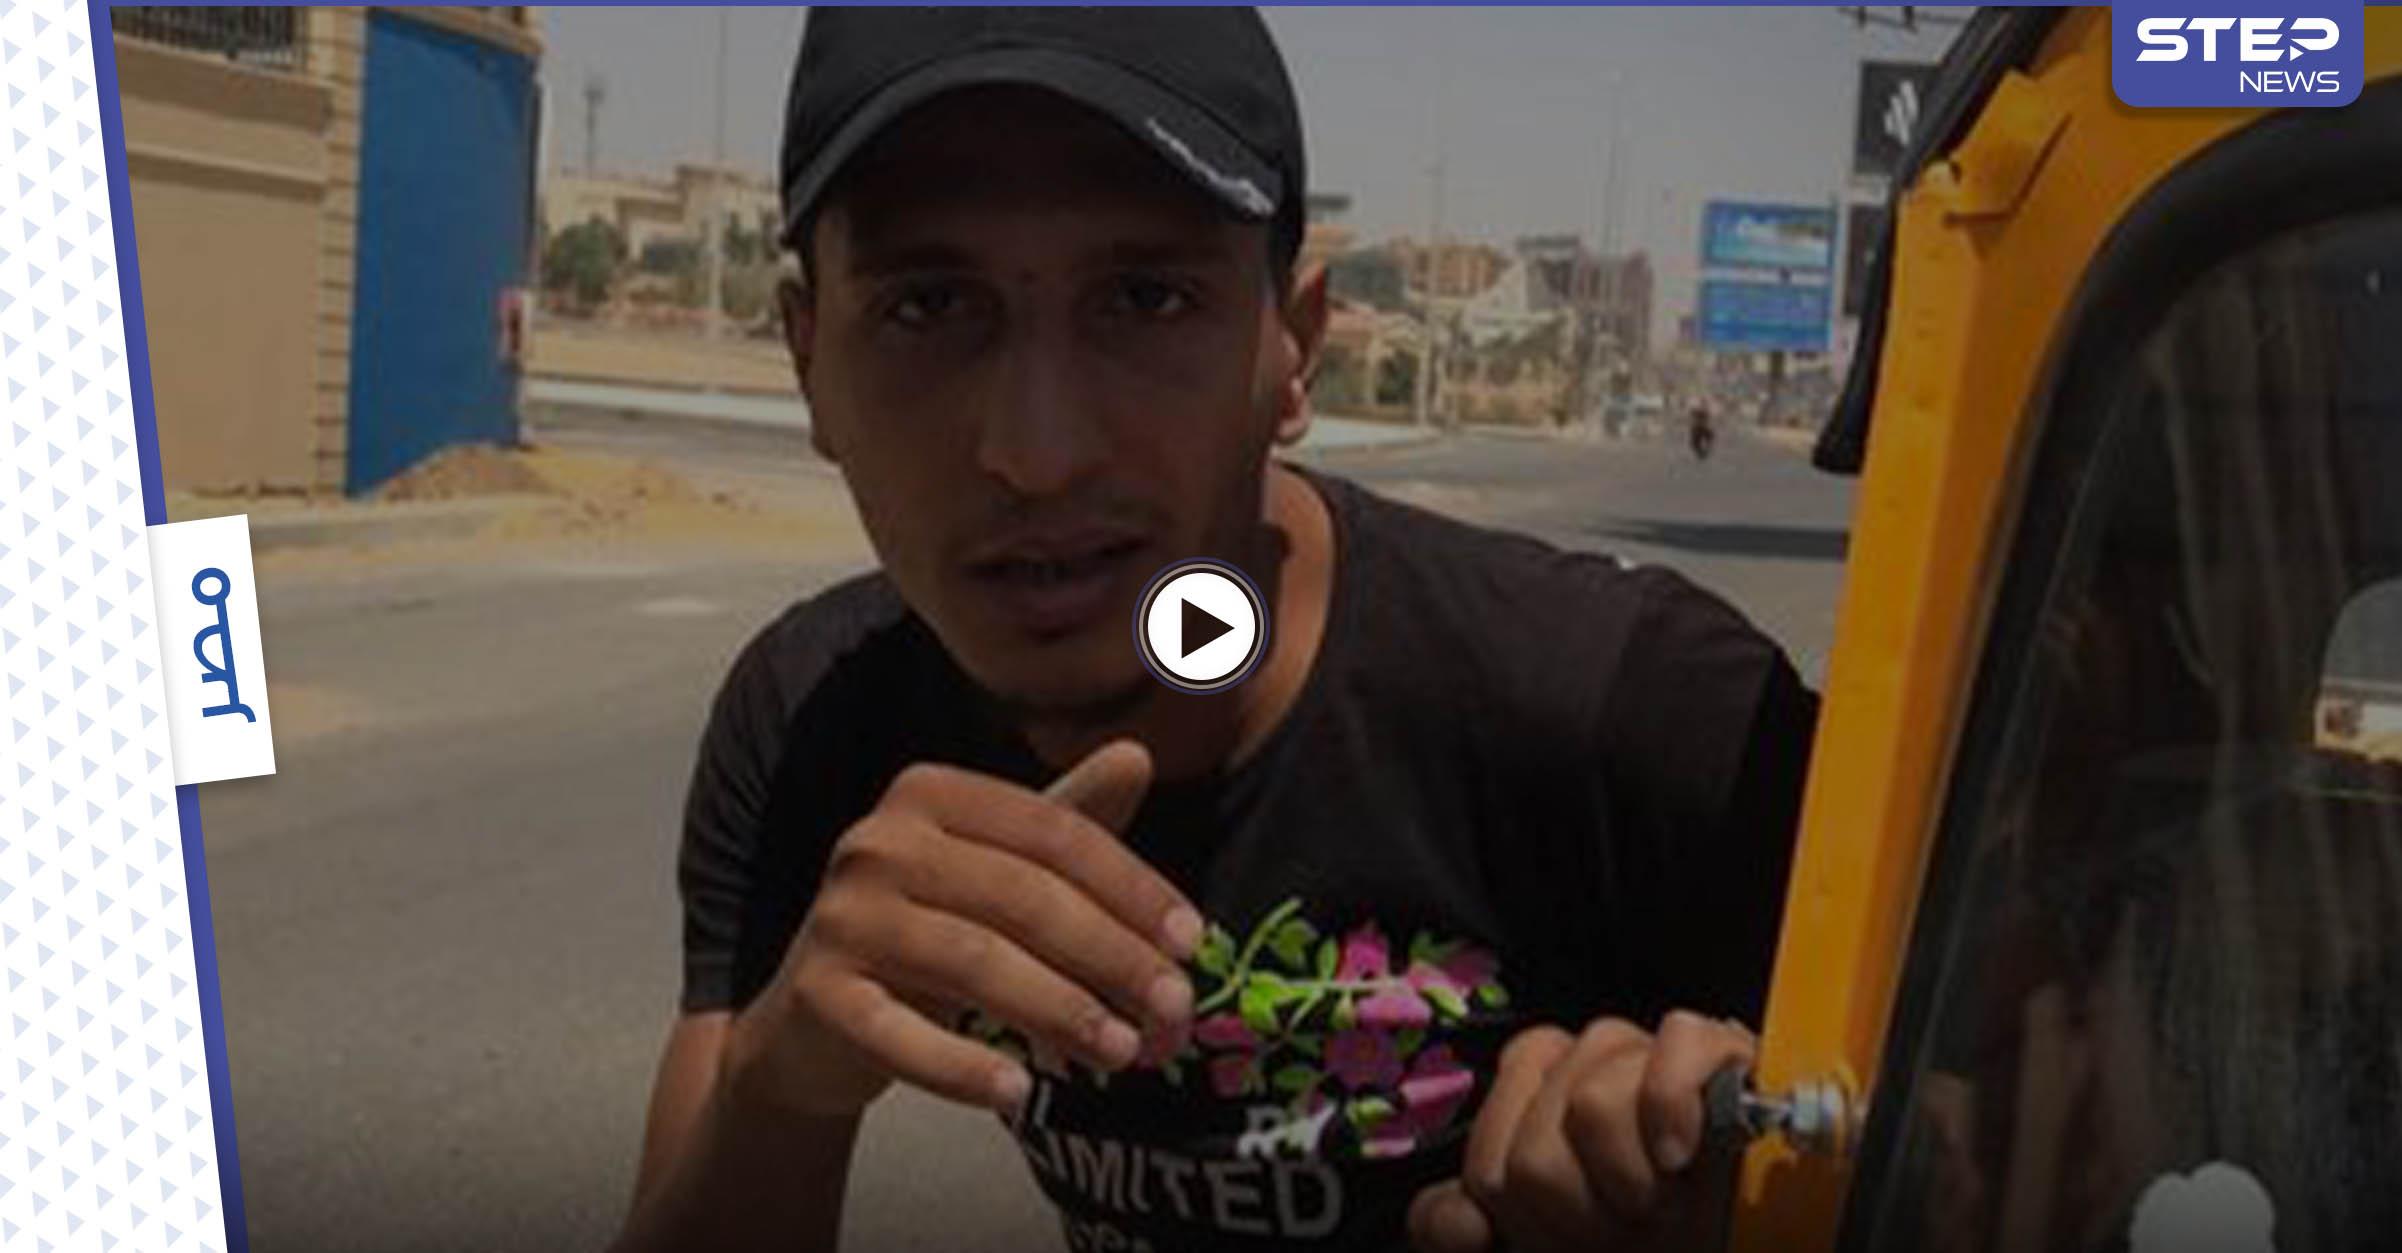 سائق توك توك مصري